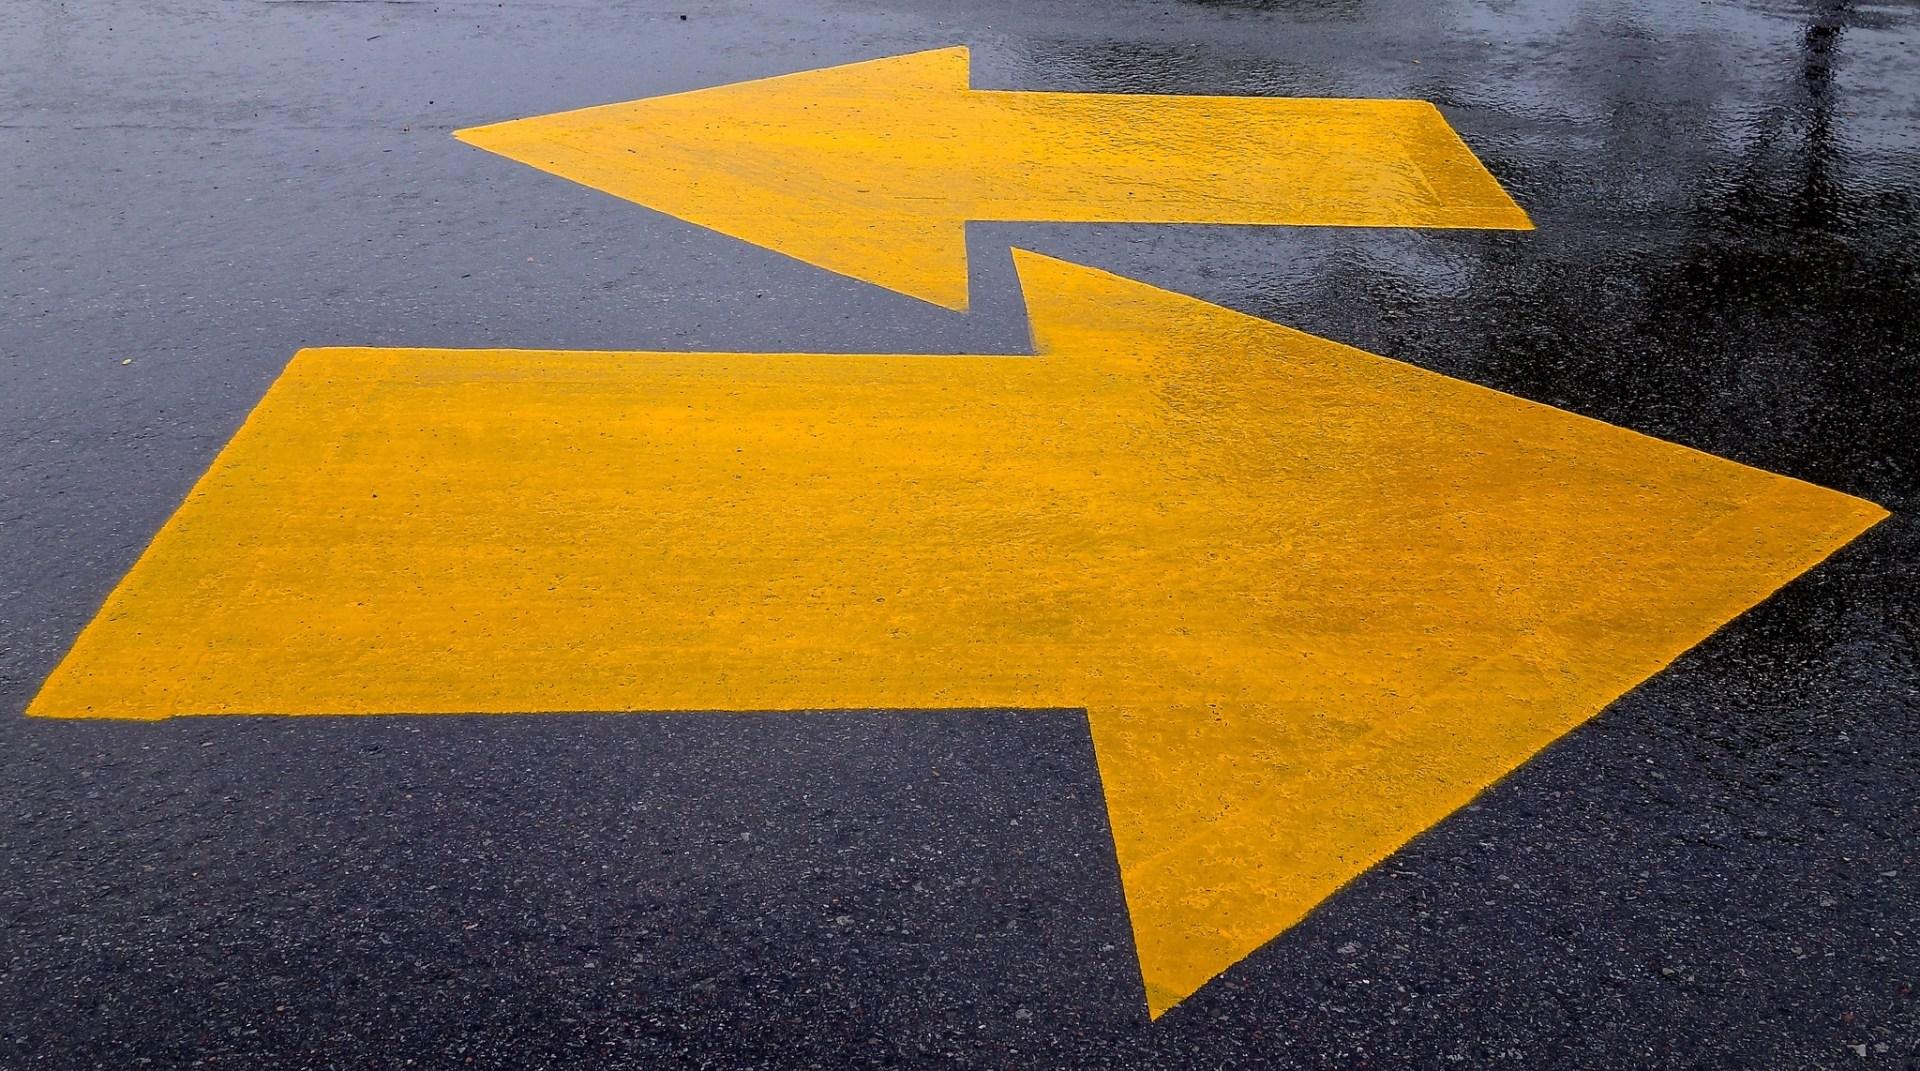 Understanding key differences between divergent & convergent thinking